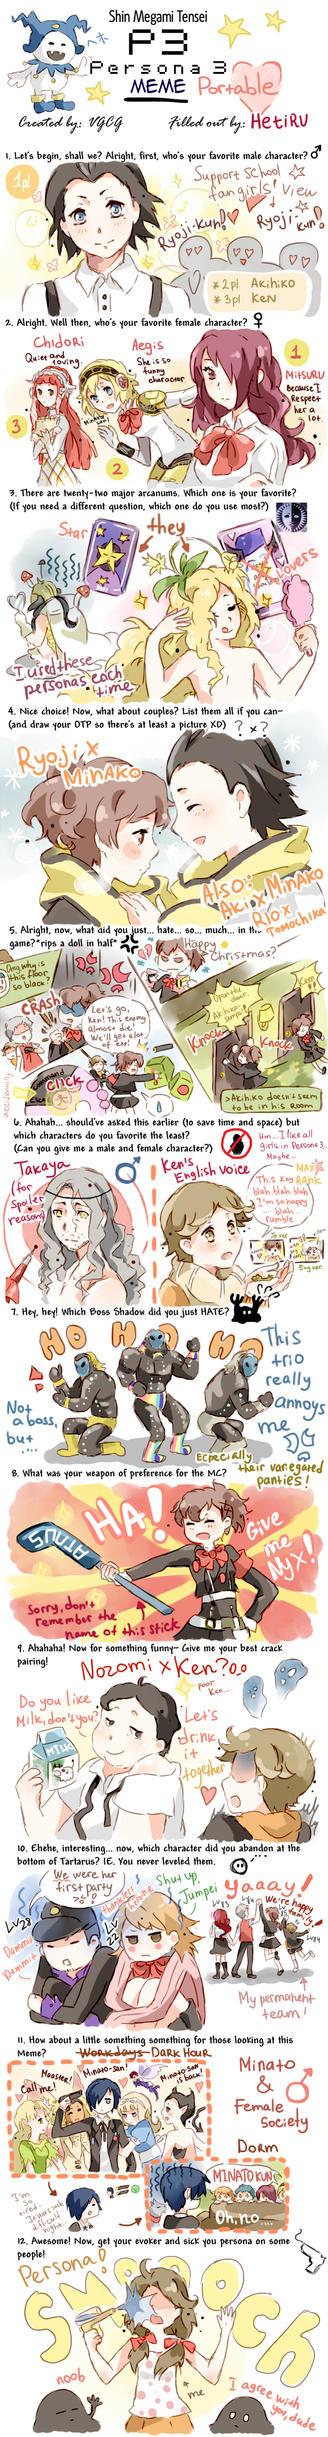 .Persona 3 Portable MEME. by Hetiru